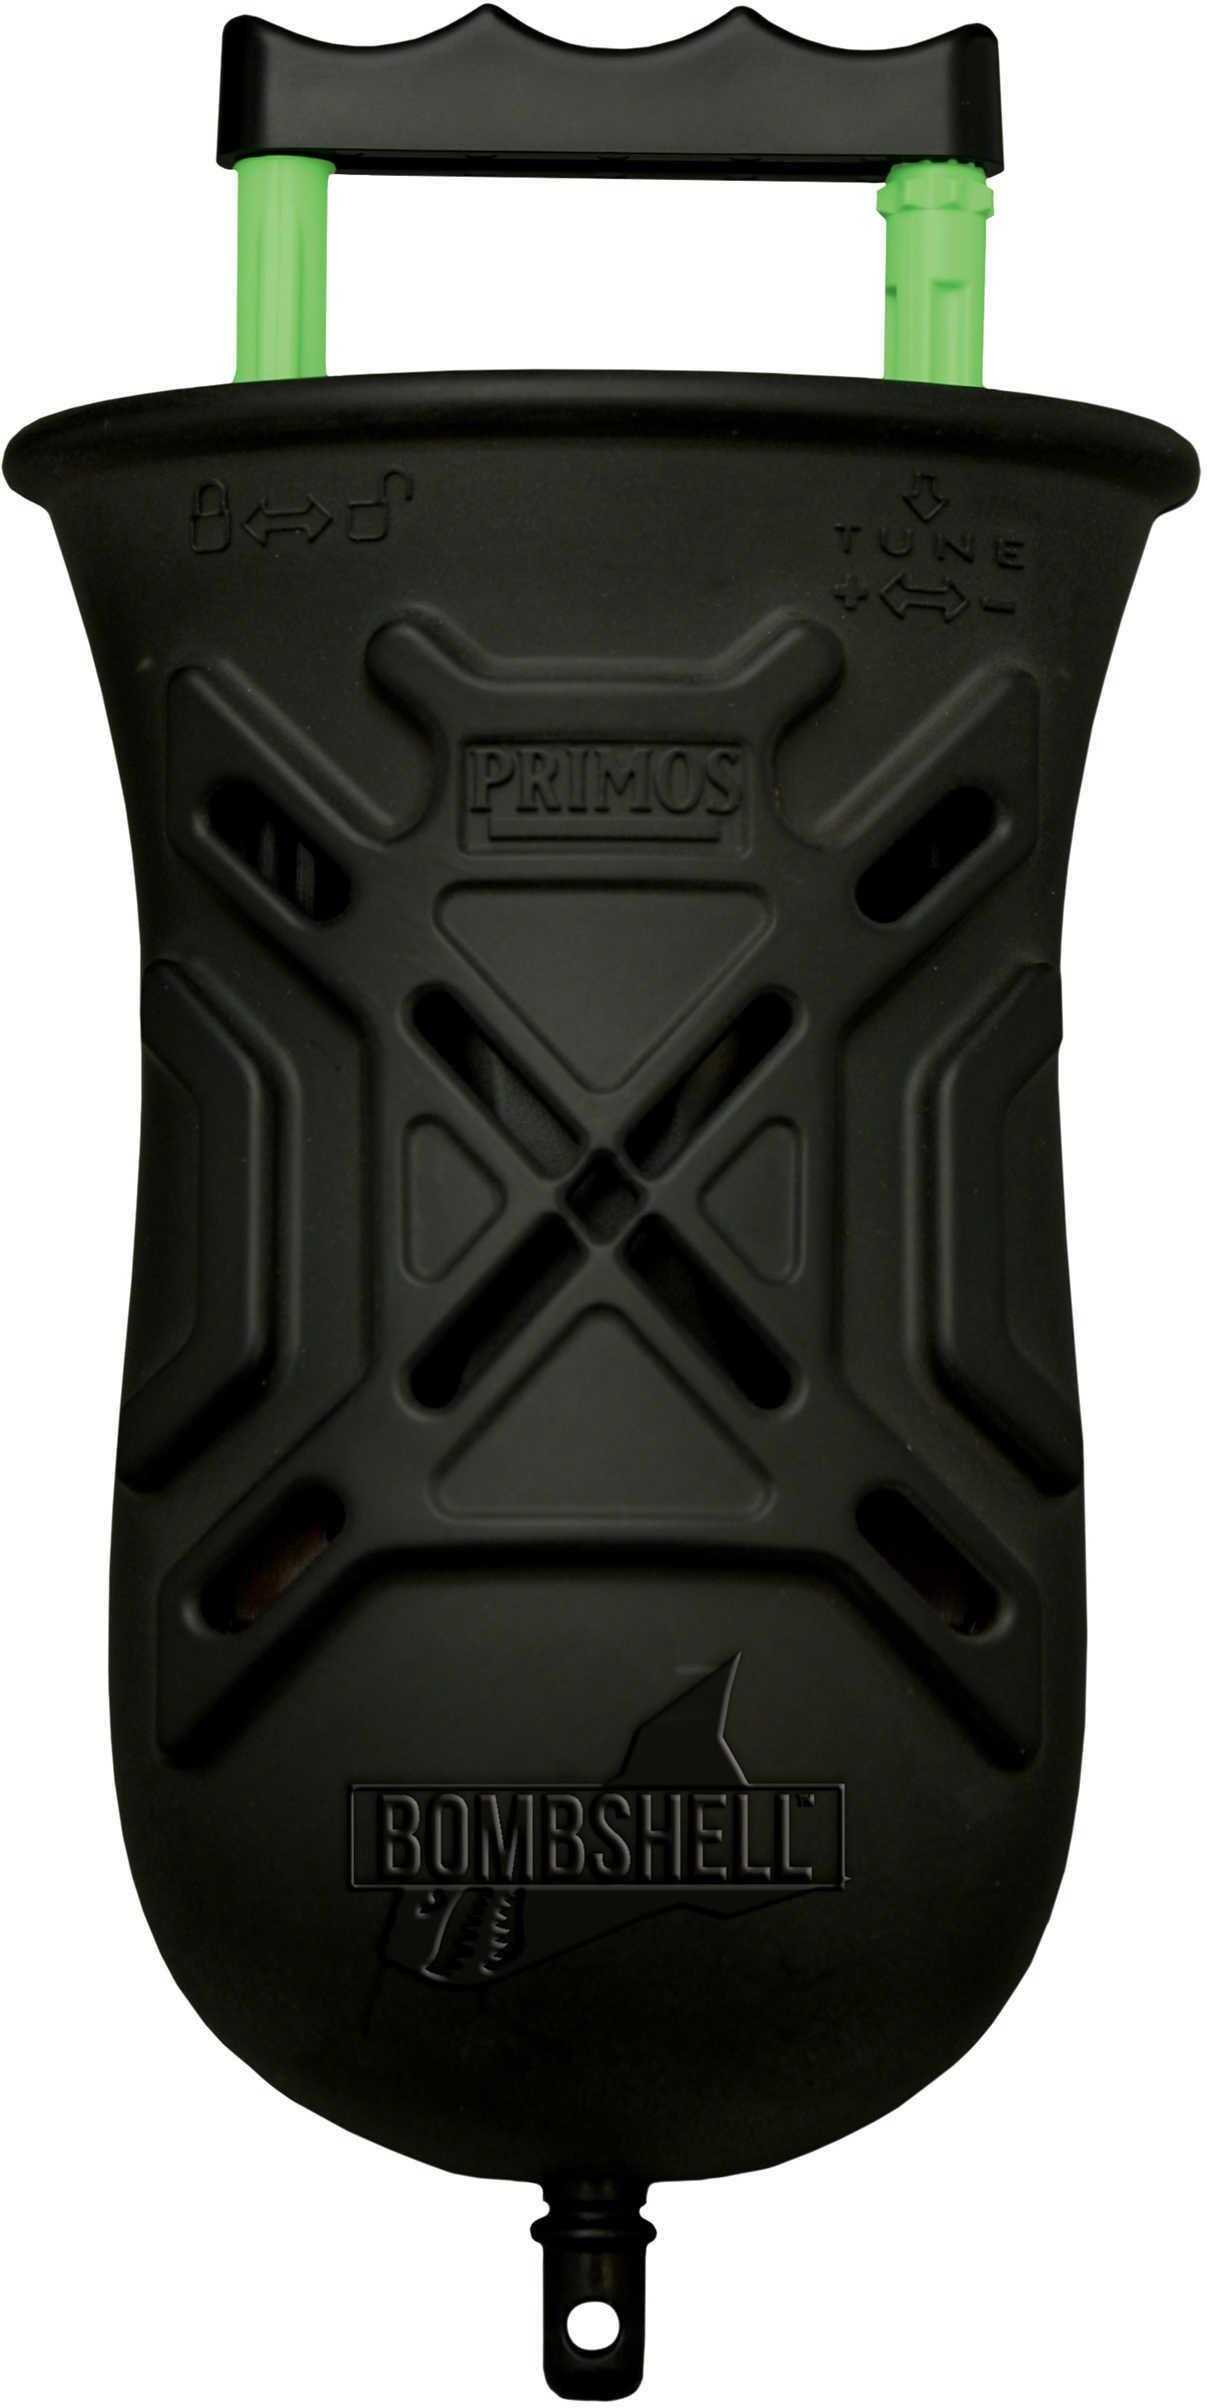 Primos Bombshell Turkey Call Model: PS209